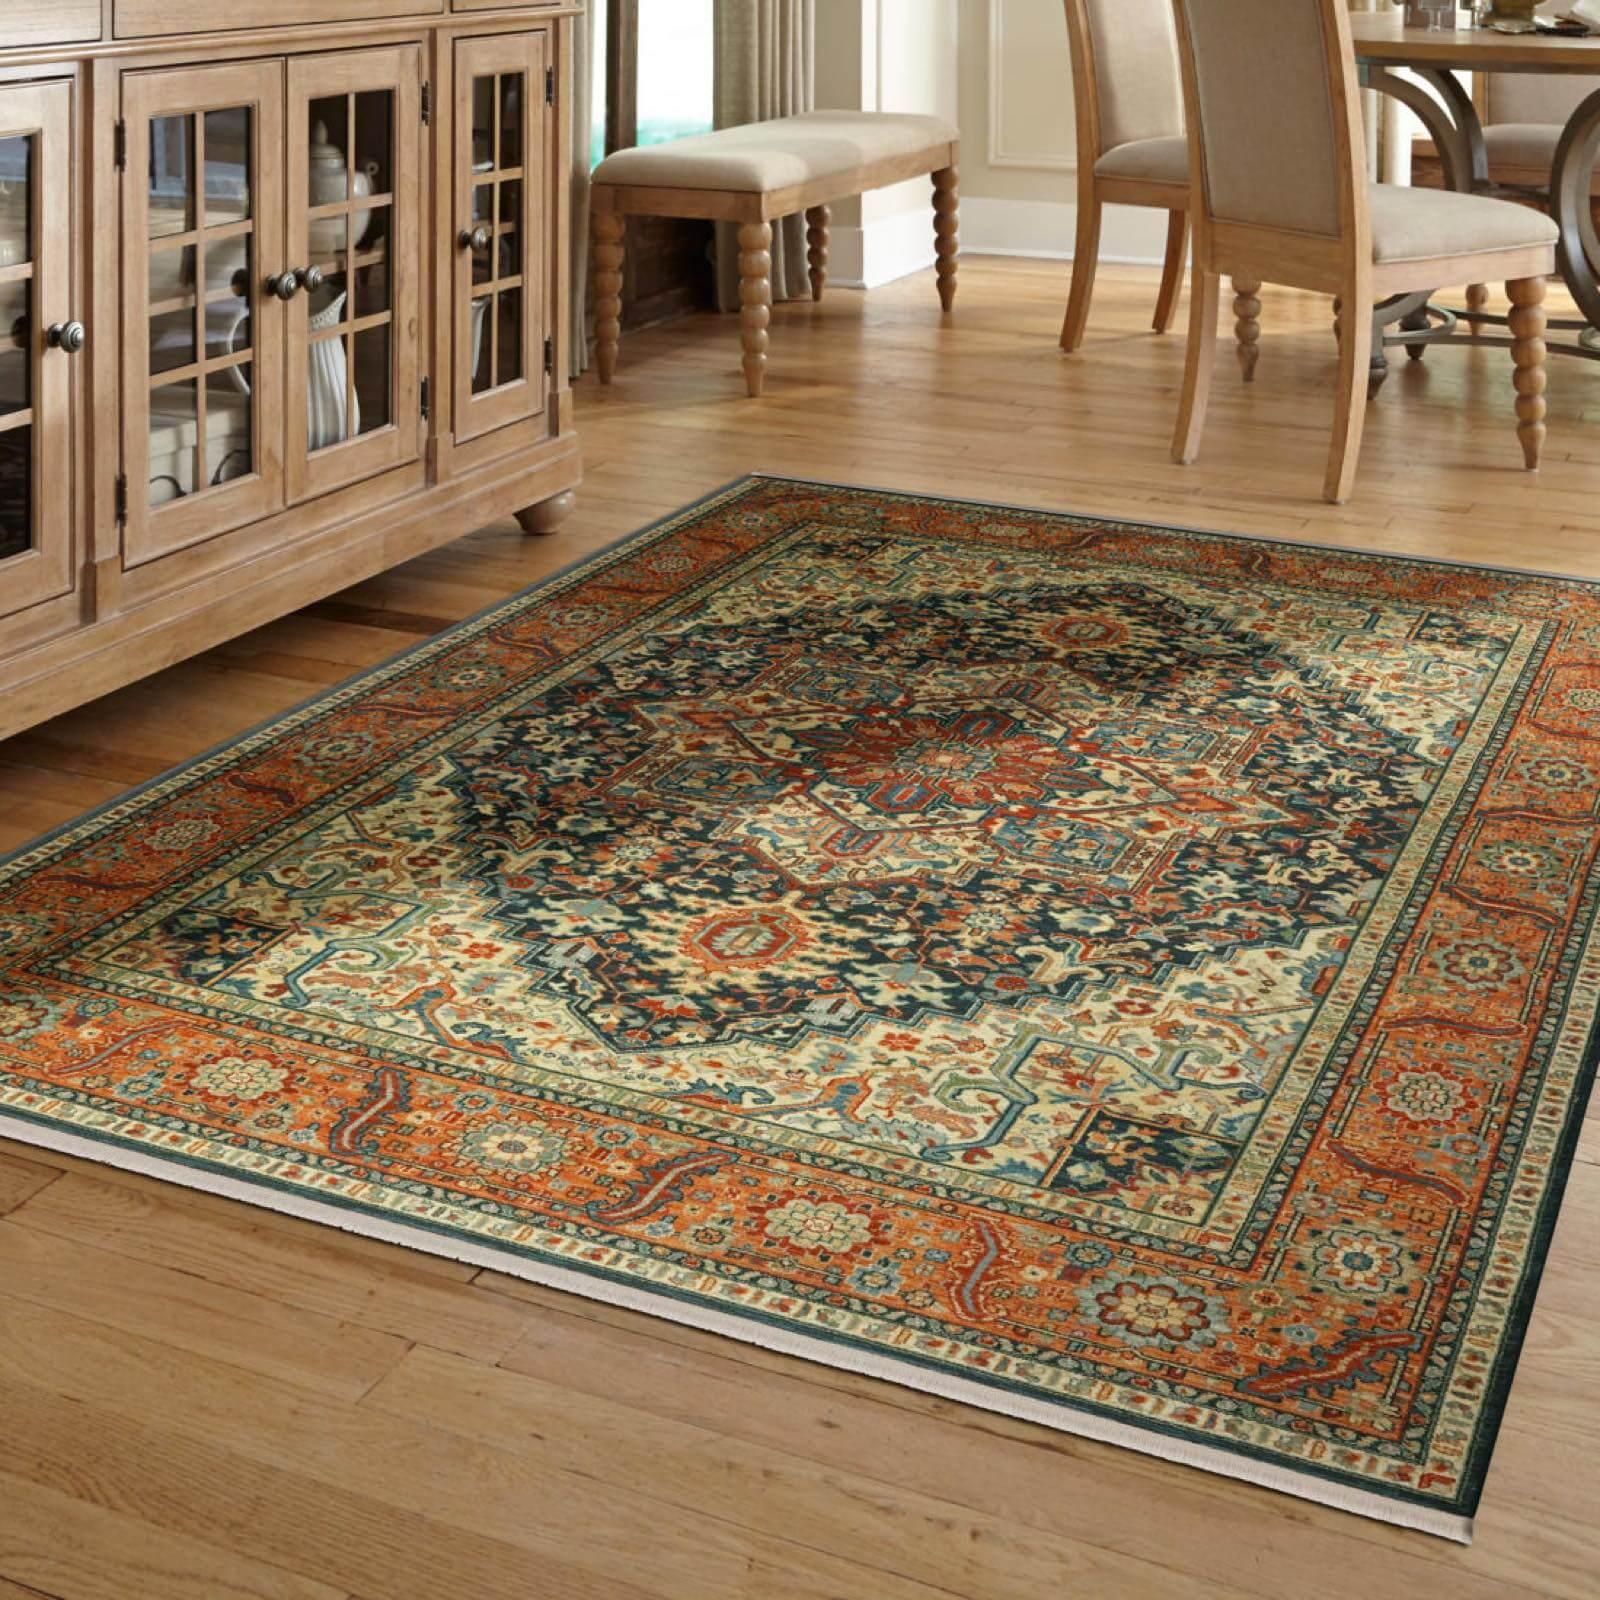 Rug design | Great Floors